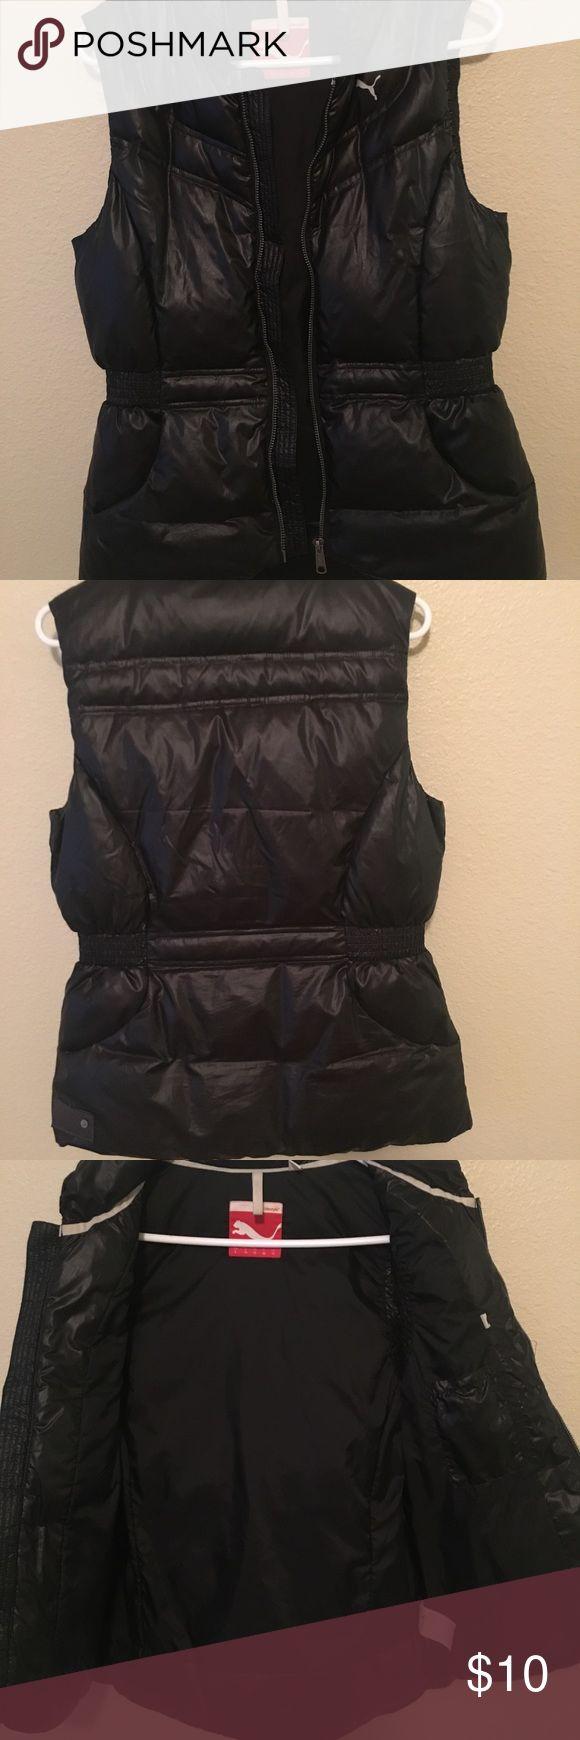 Puffer vest Puma Good condition vest. Warm and nice! Puma Jackets & Coats Vests